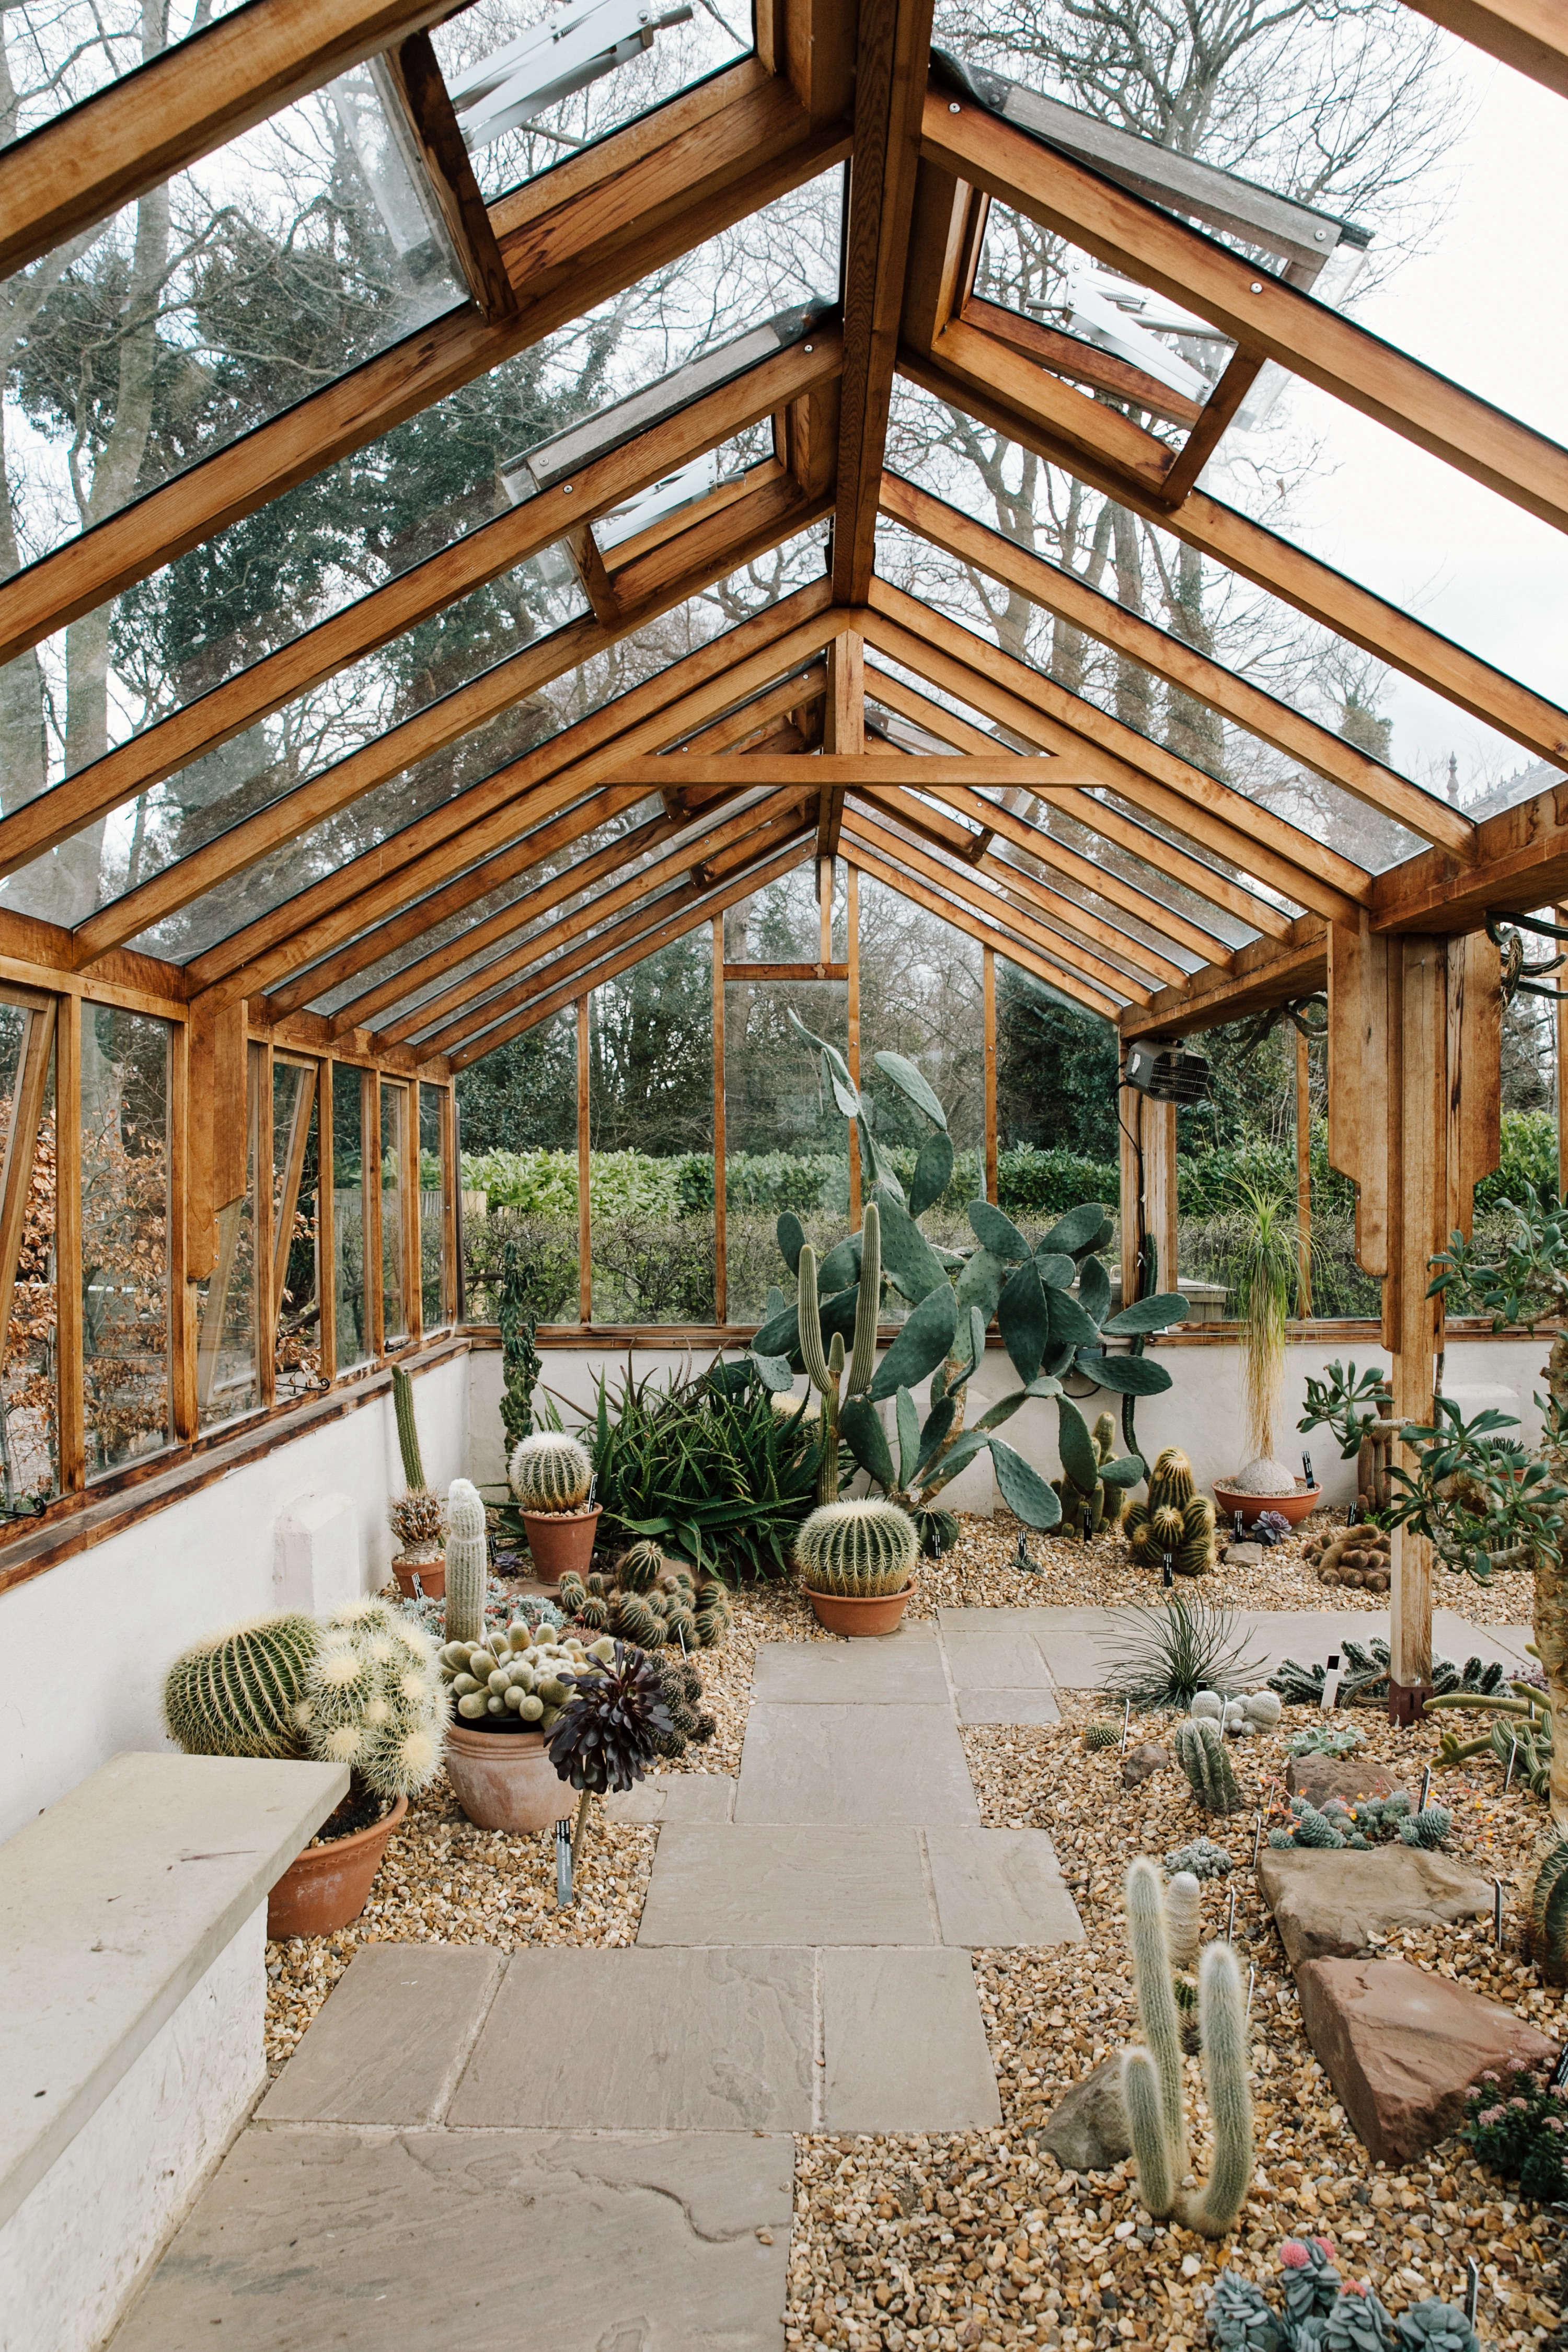 Evergreen Book Winterbourne Greenhouse by Haarkon